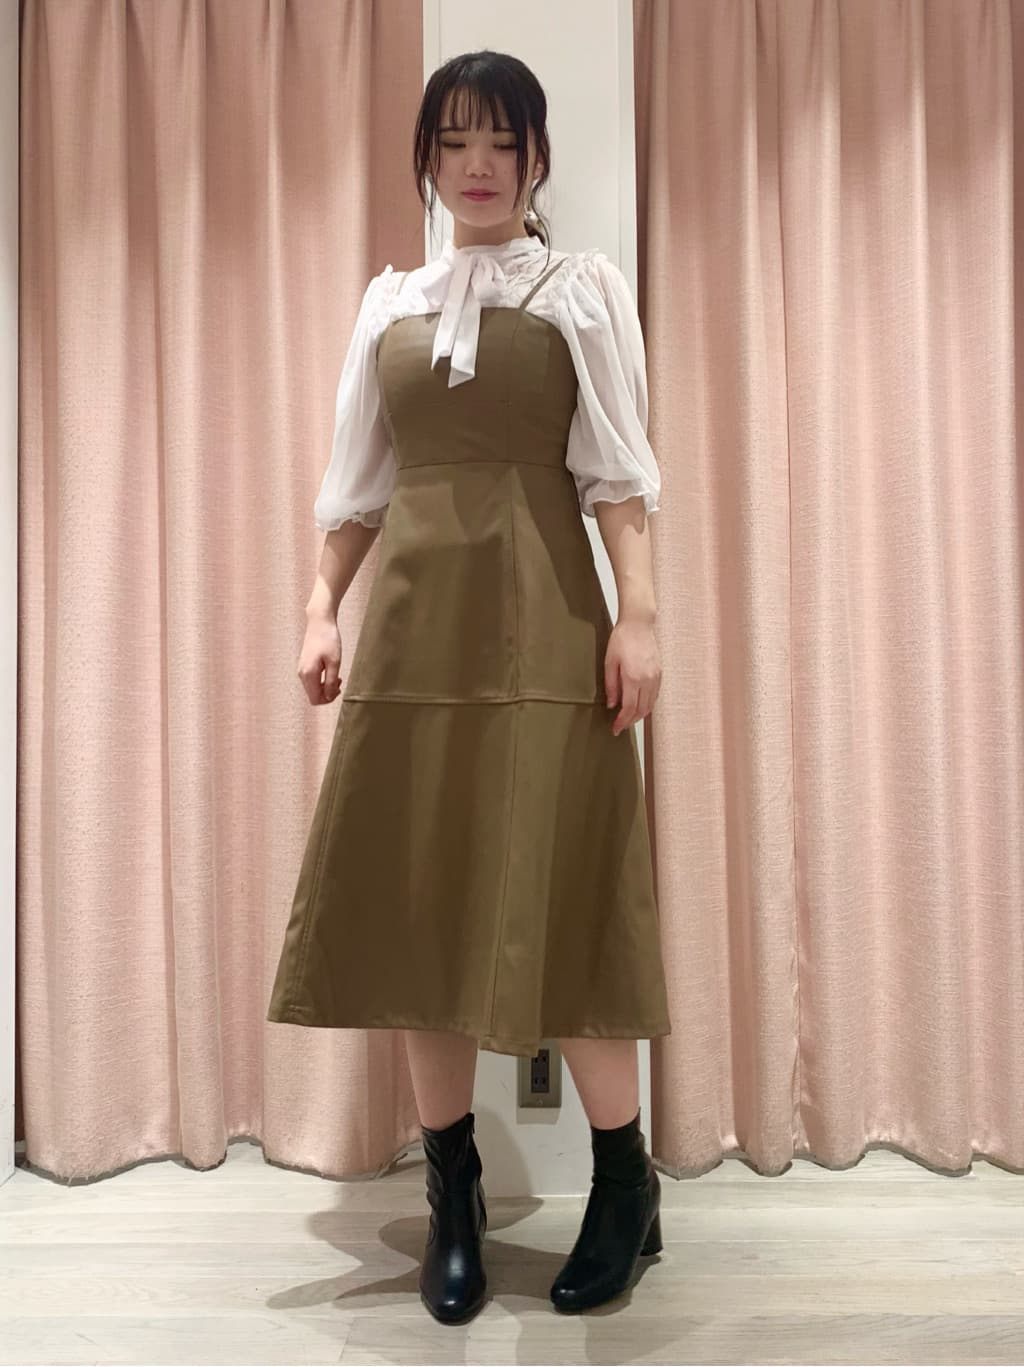 honoka(168cm)